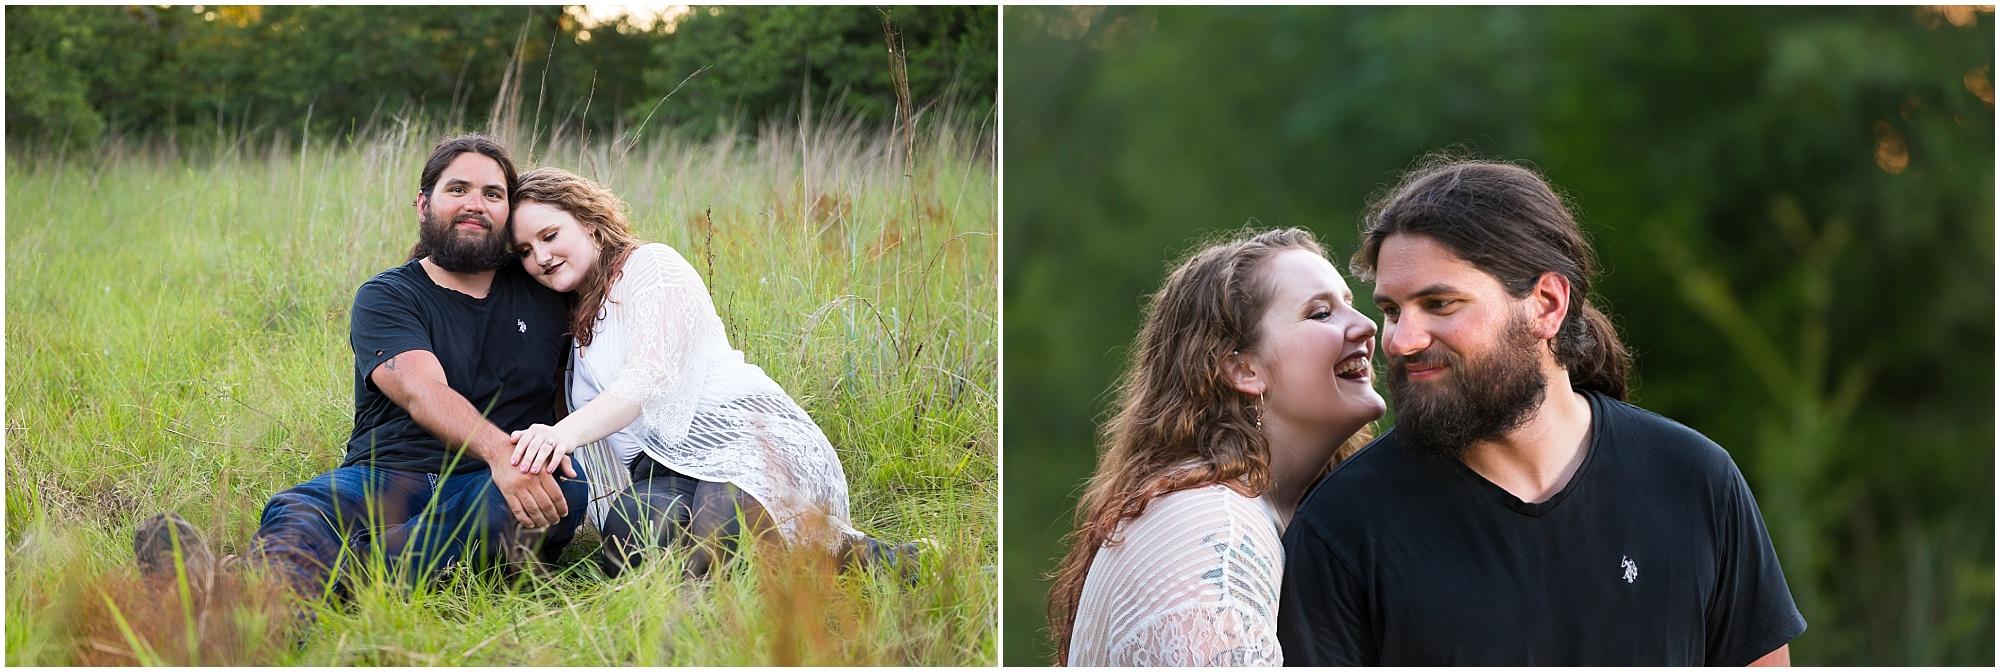 A girl rests her head on her fiance's shoulders during their engagement portrait session - Jason & Melaina Photography - www.jasonandmelaina.com